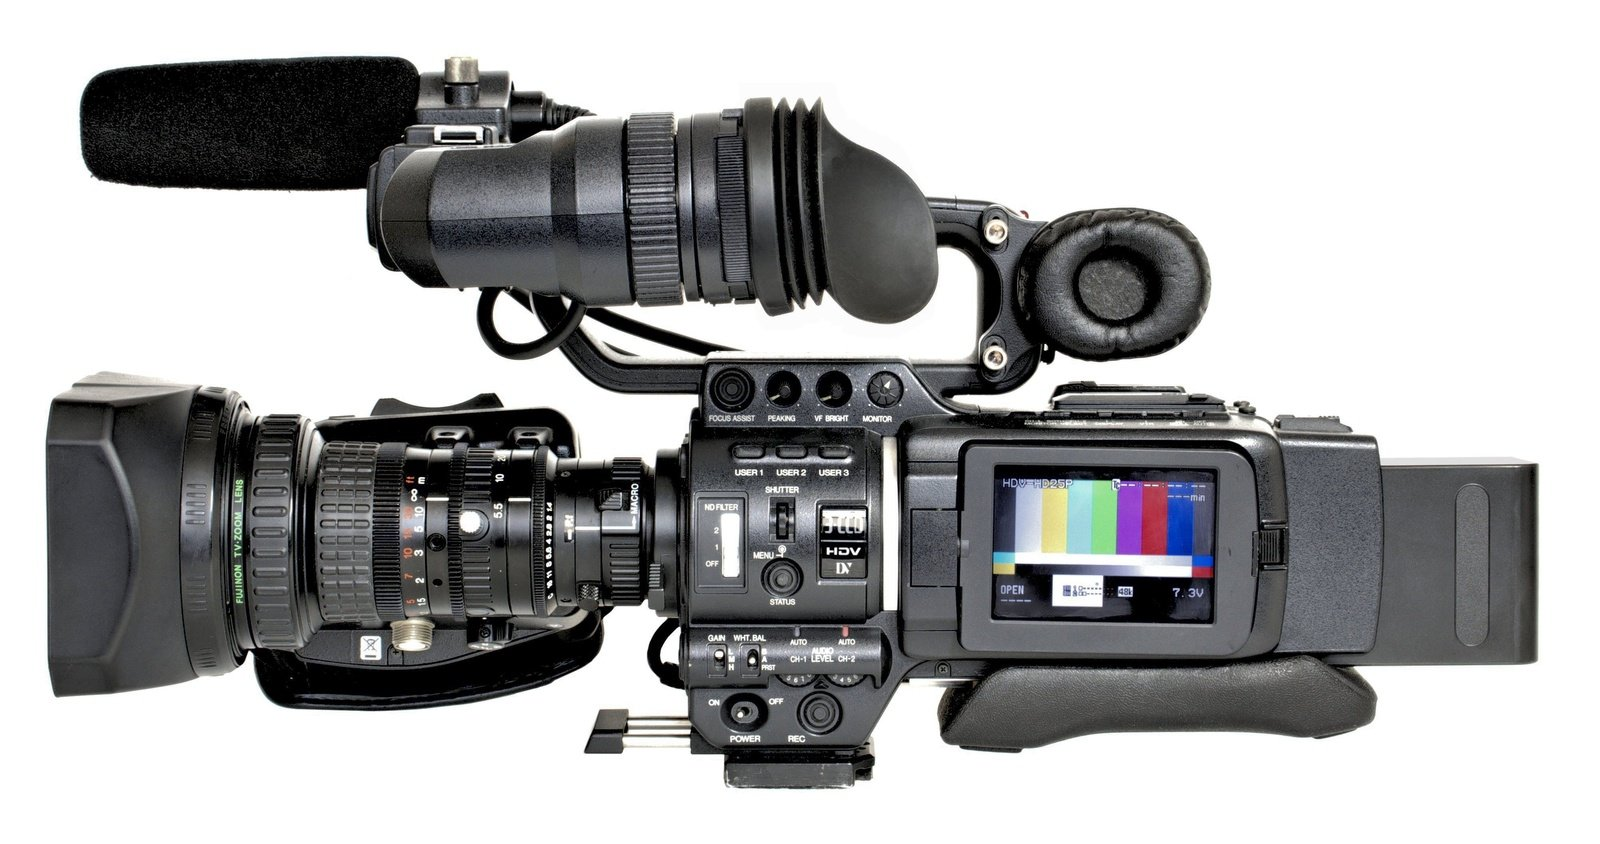 JVC GY-HD100 mit Beillen BL-V488 Akku.